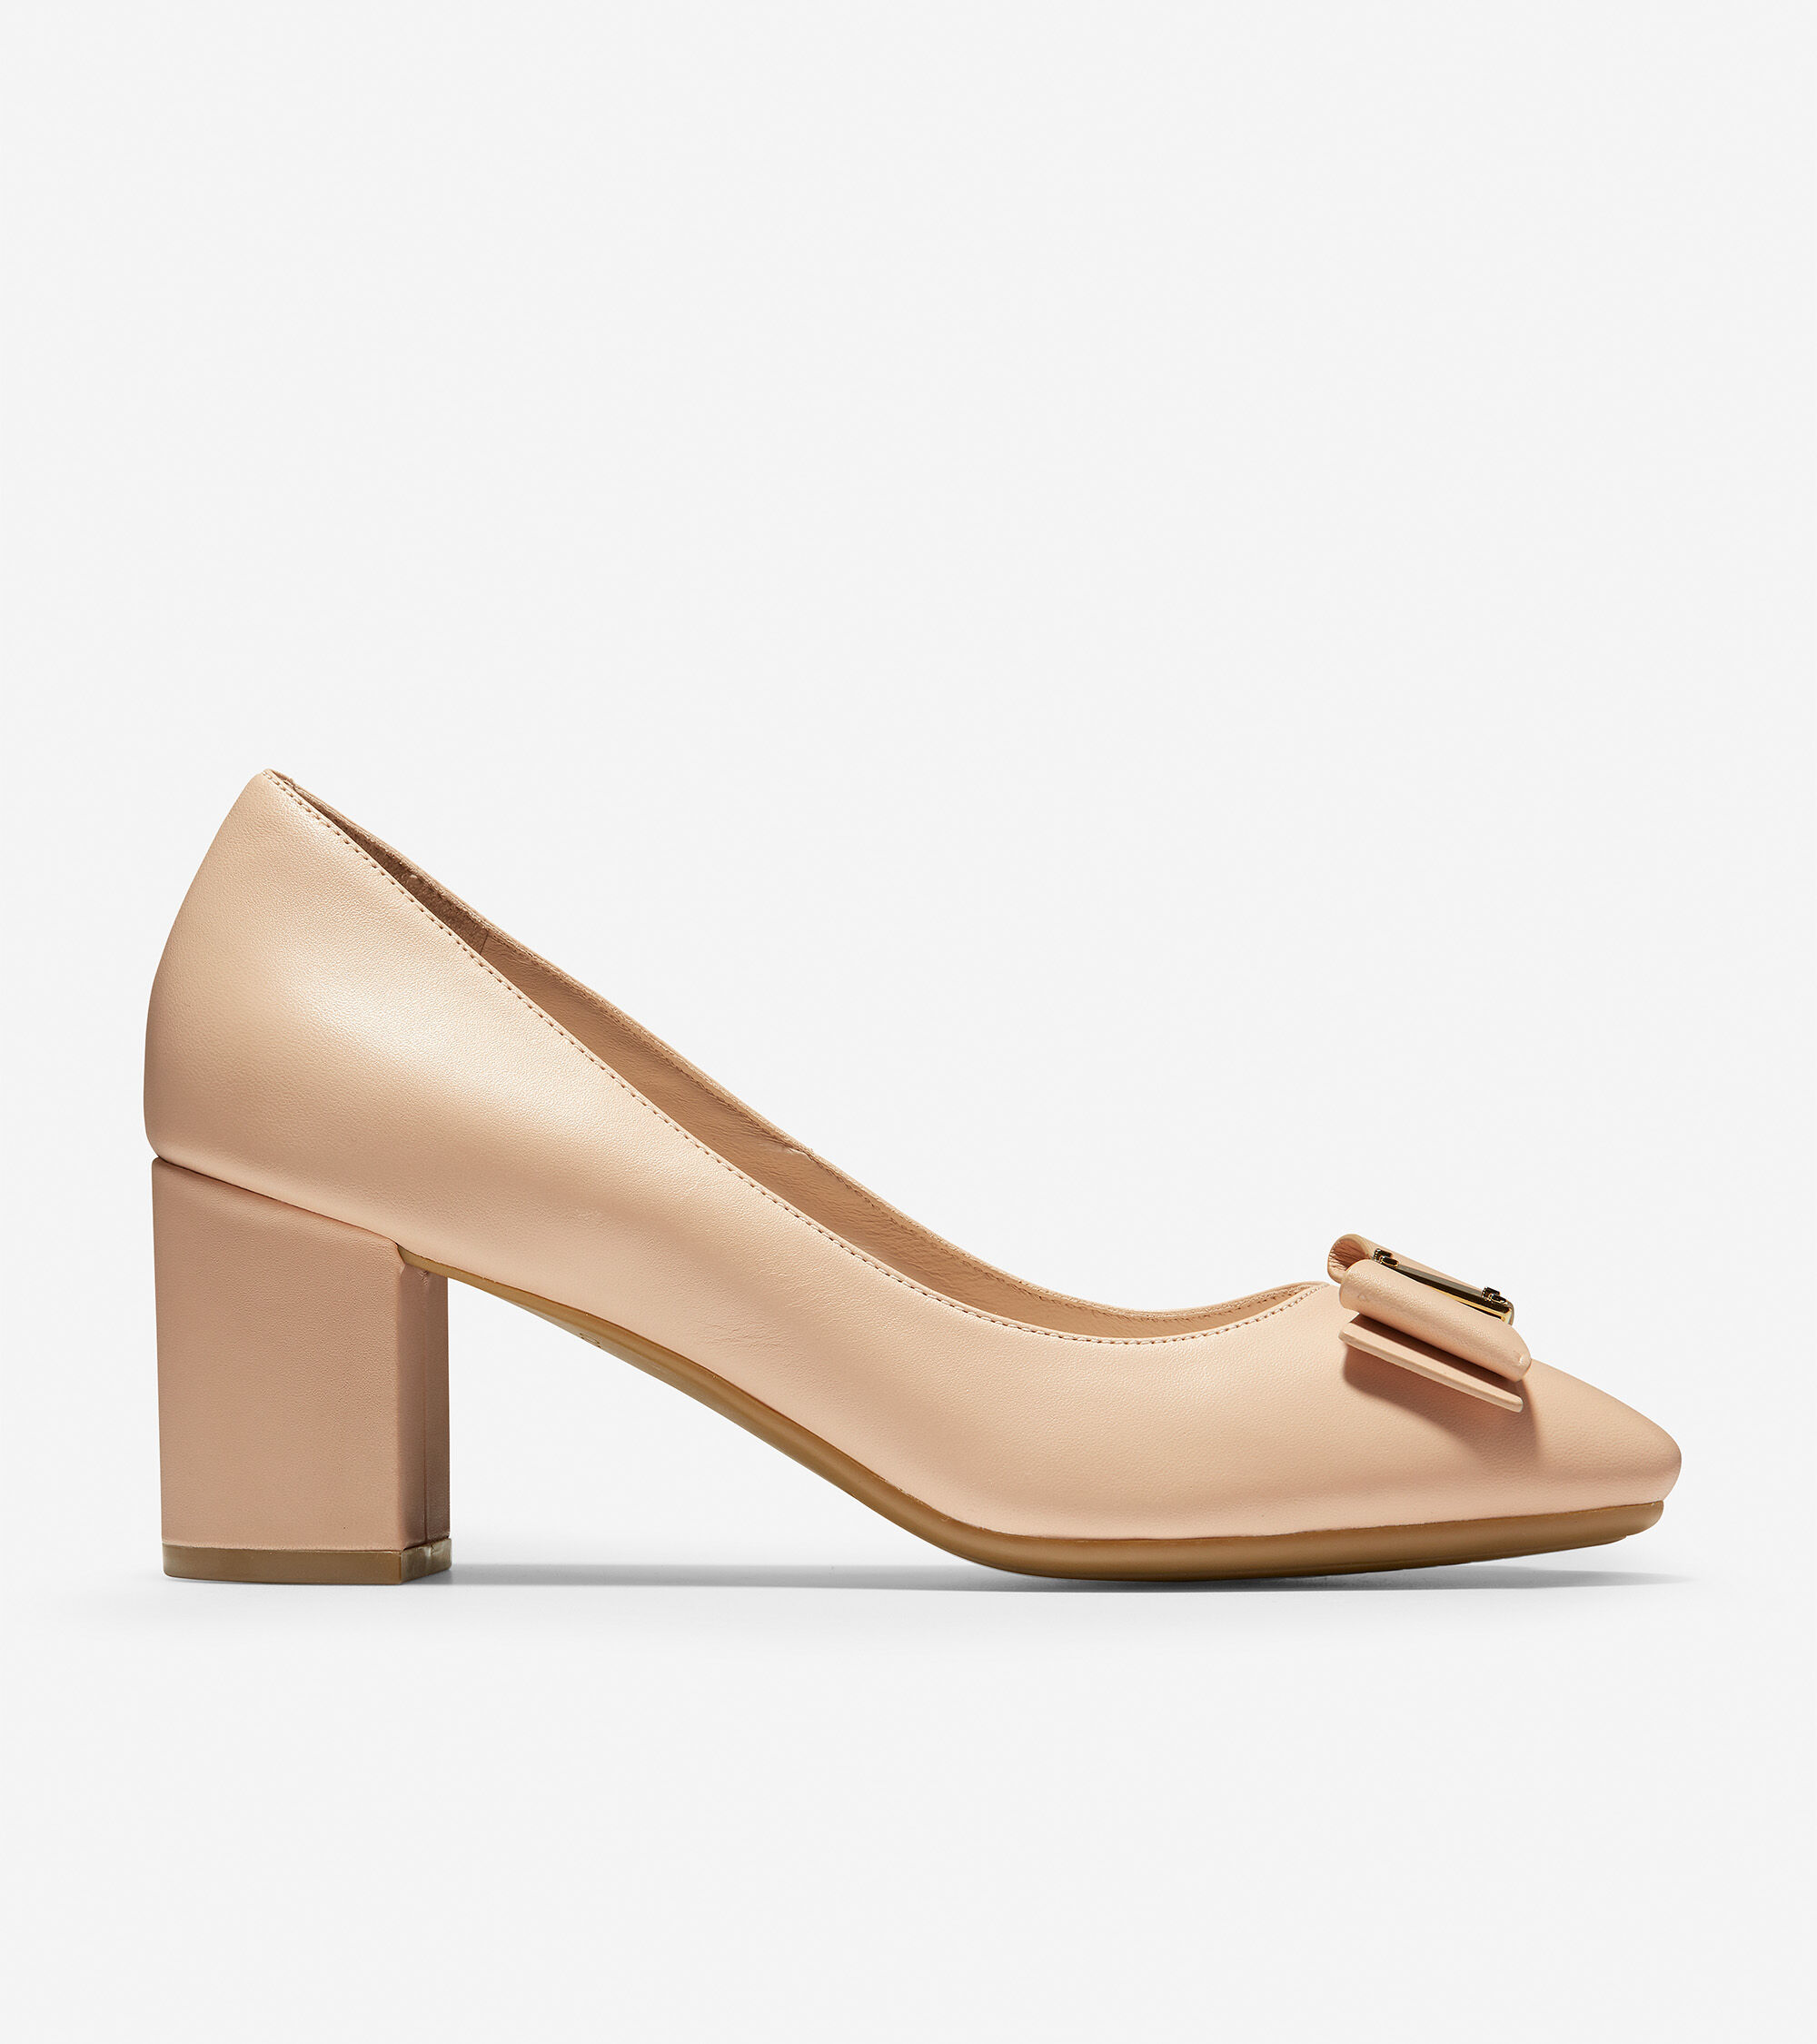 Specials Women Cole Haan Belline Sandal Taupe/RoseGold - K7T1165465